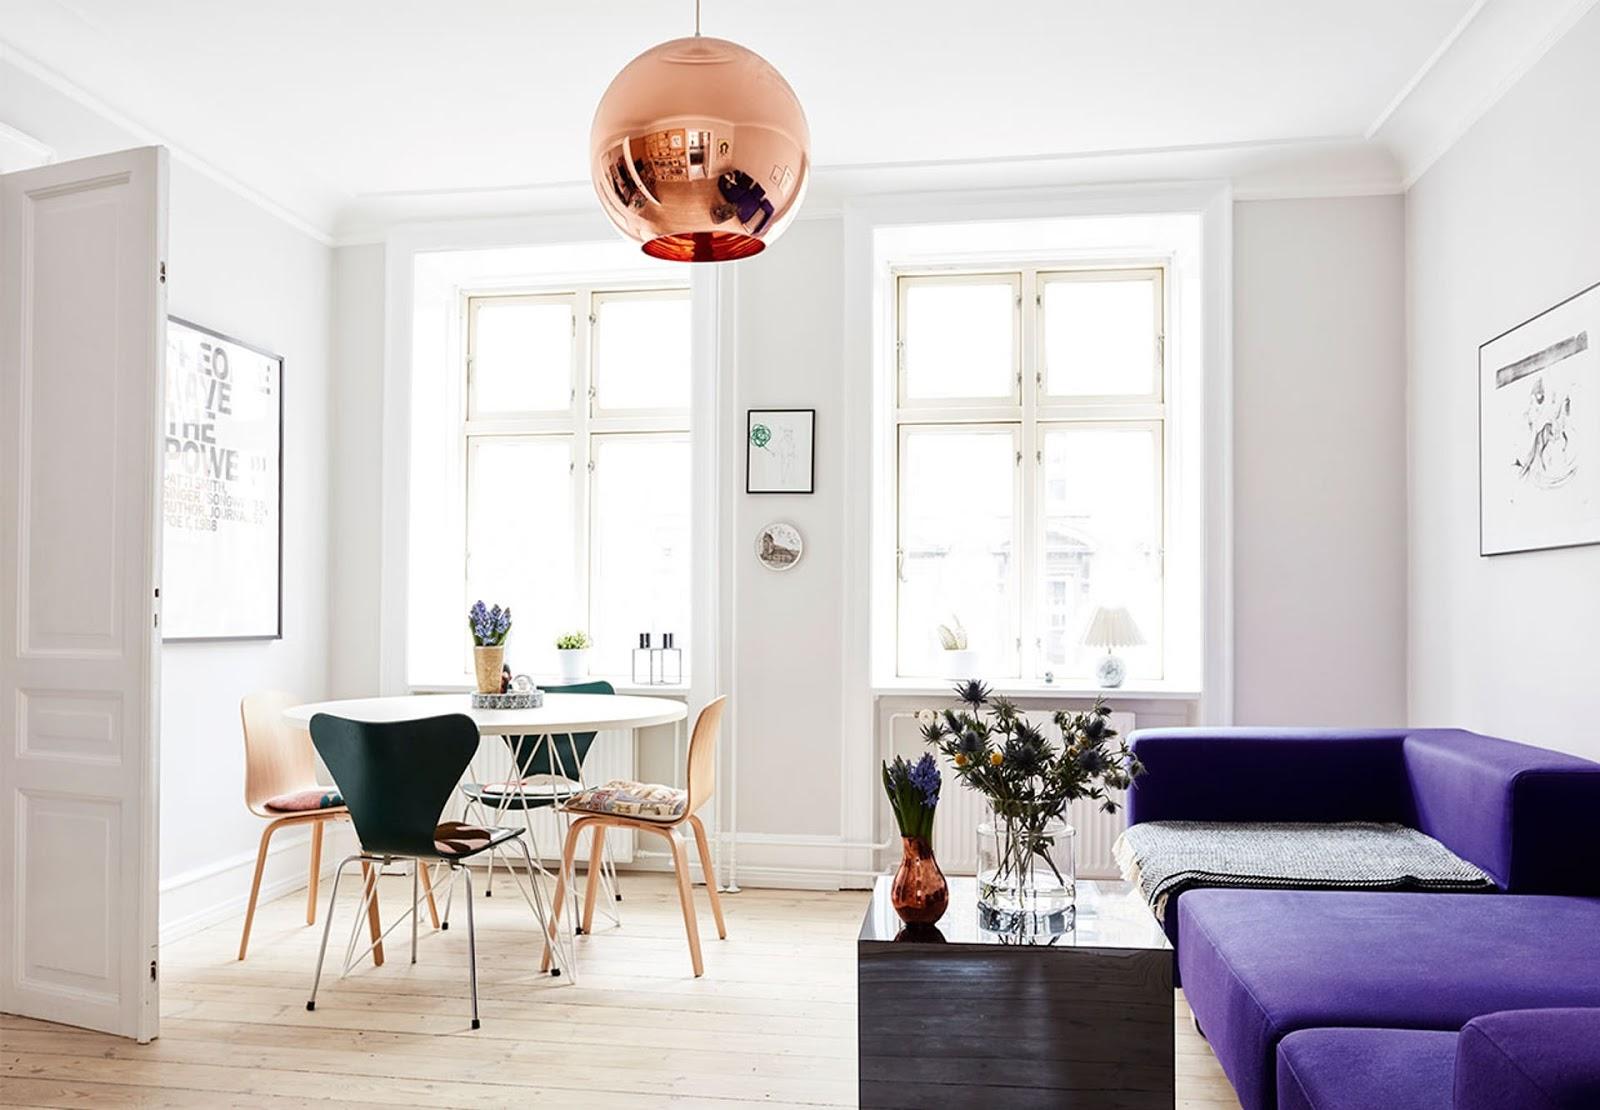 nordic design, copper lamp, arne jacobsen chair, mid century modern furniture, bright interior